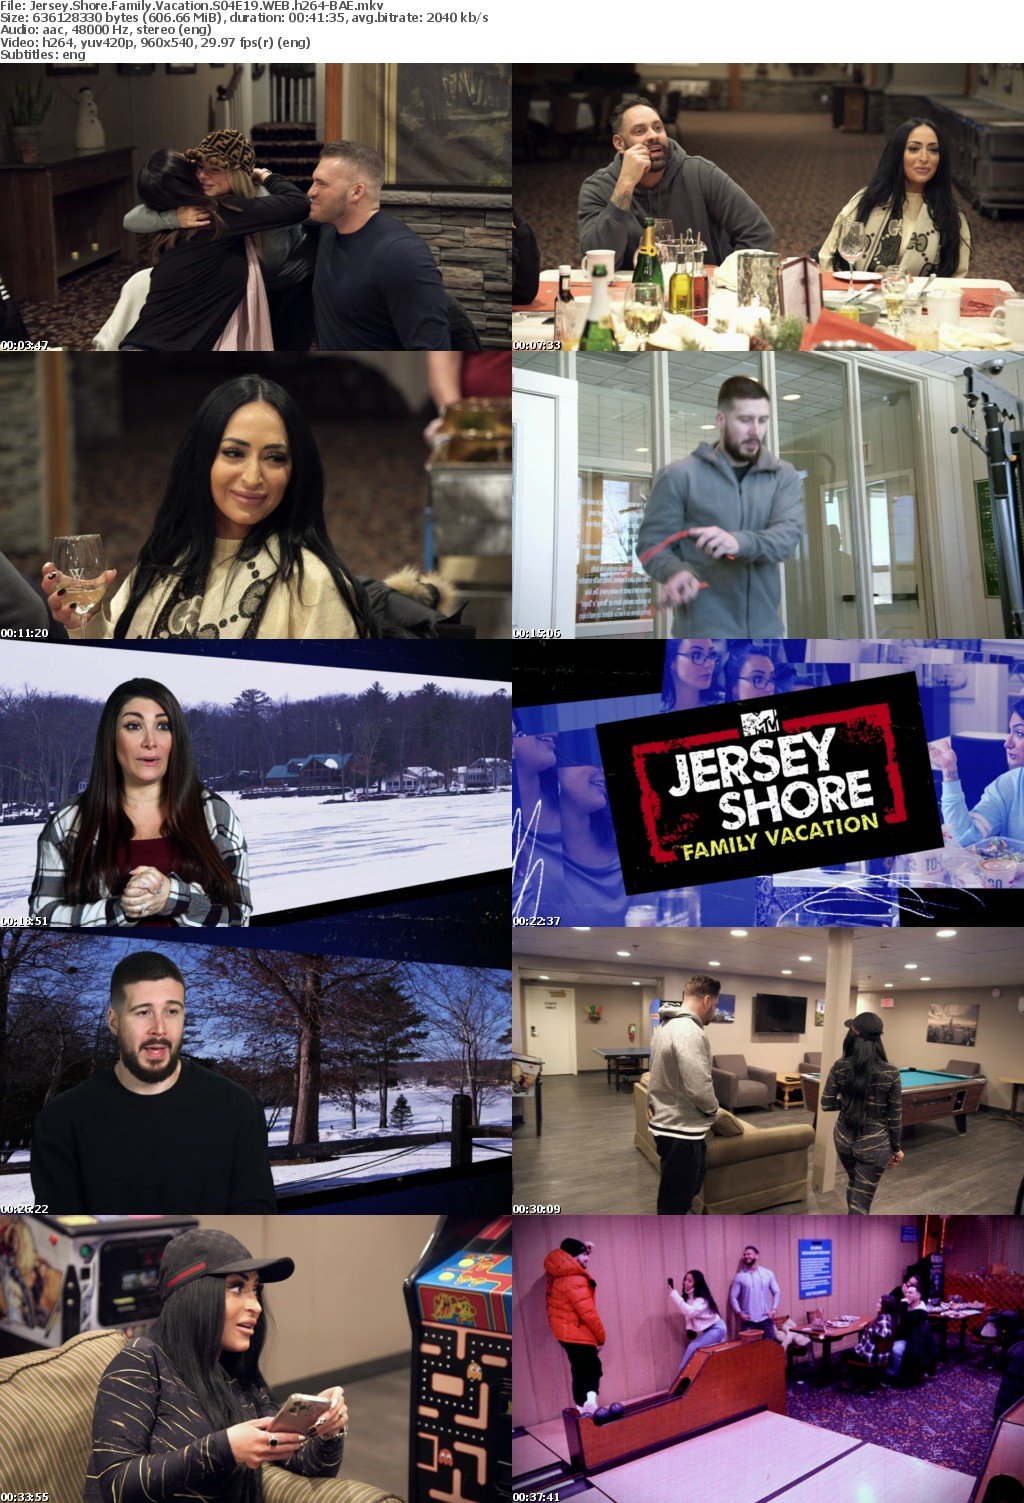 Jersey Shore Family Vacation S04E19 WEB h264-BAE